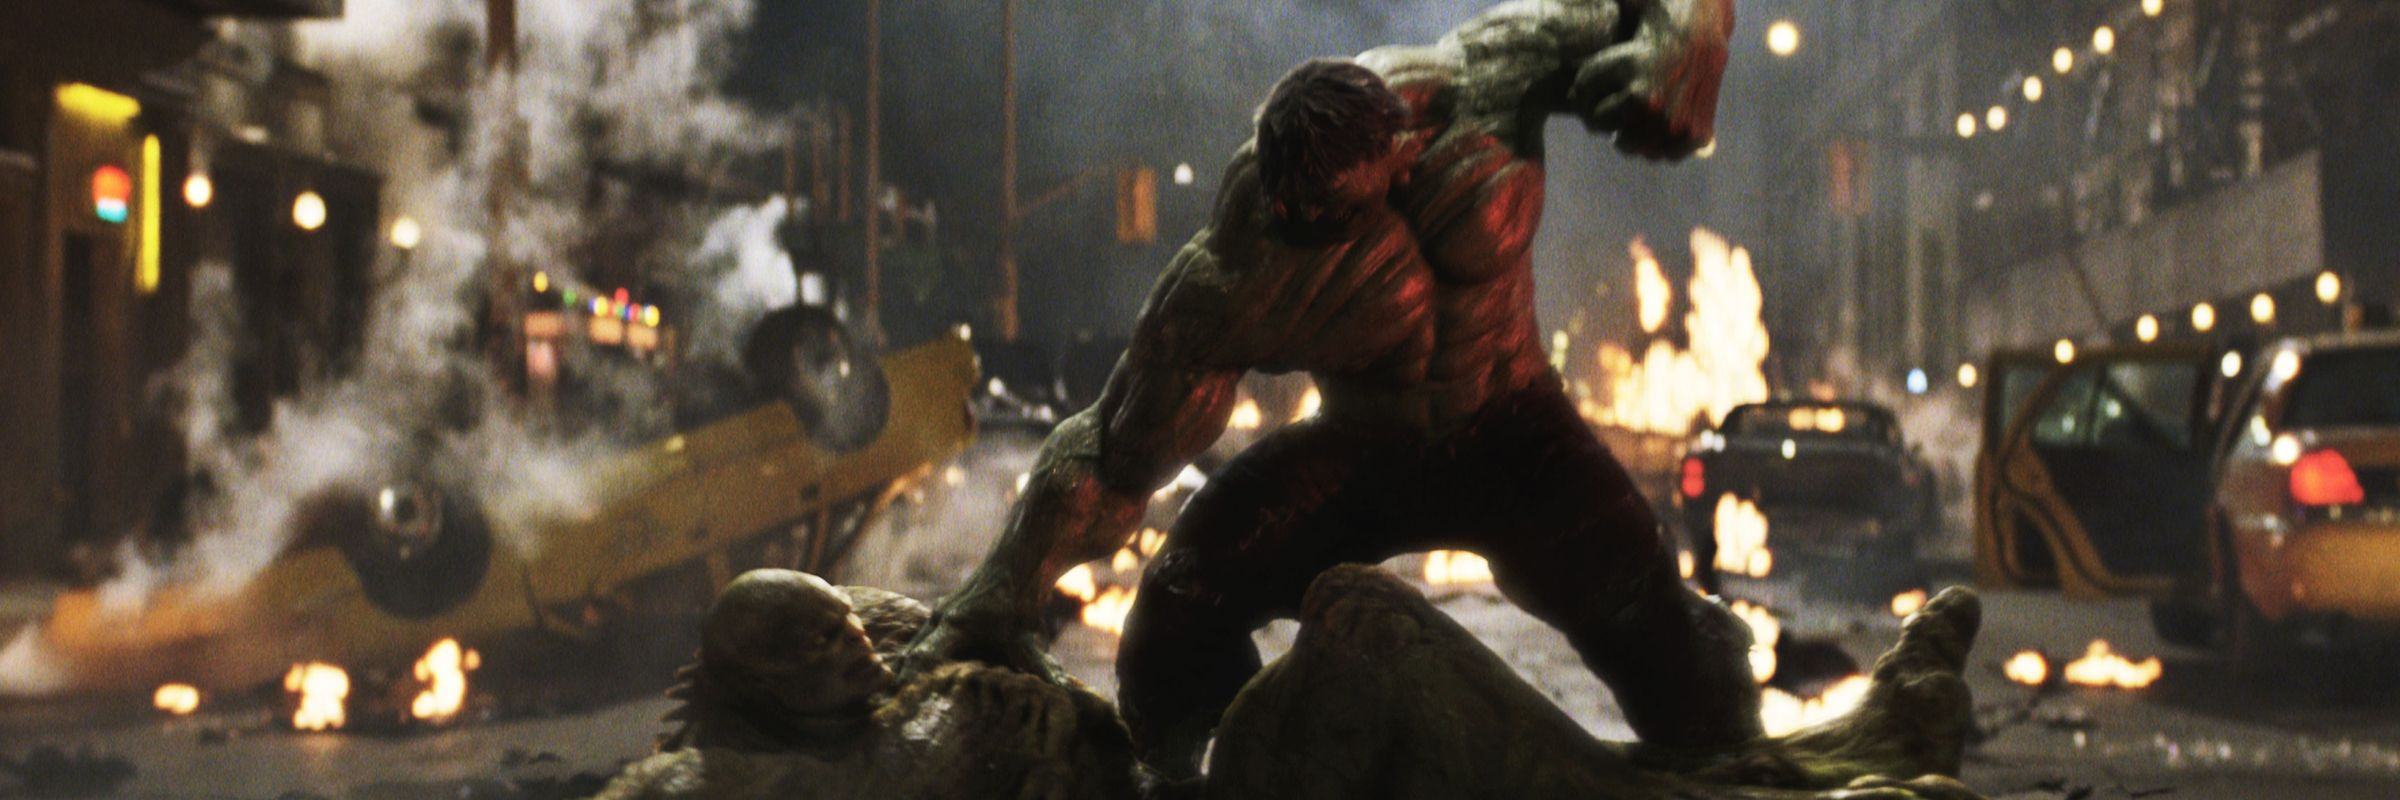 The Incredible Hulk Full Movie Movies Anywhere